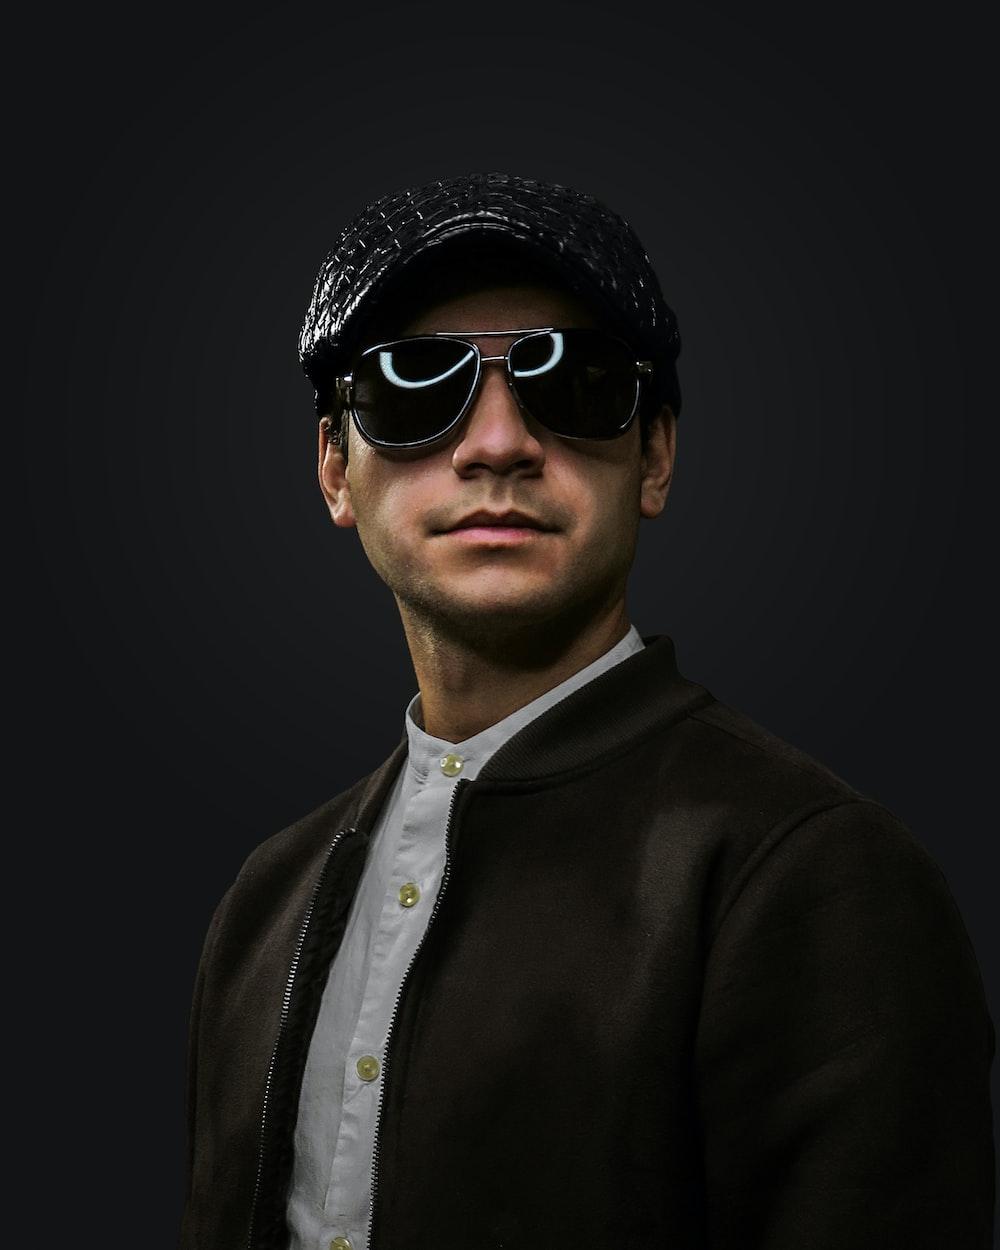 man in black suit wearing black sunglasses